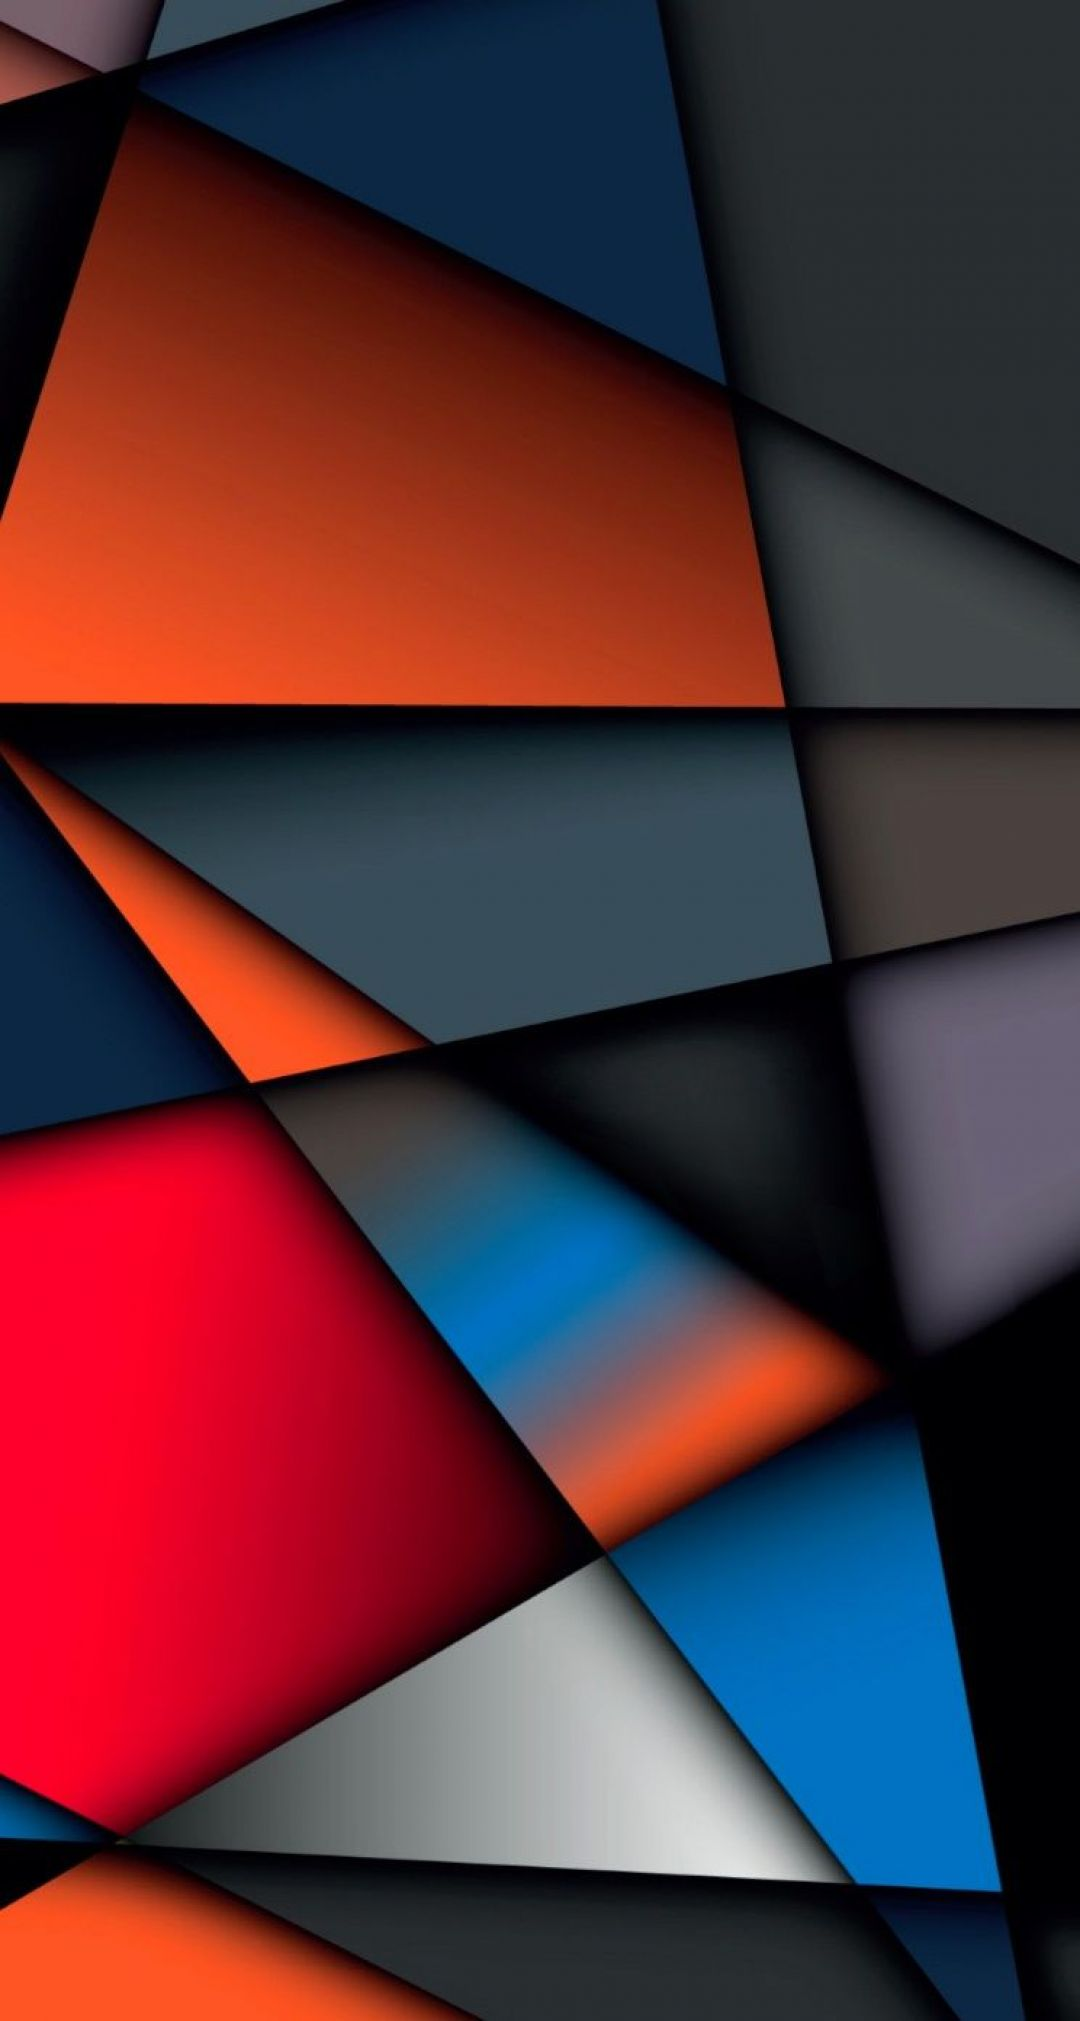 Geometry Shape Iphone 5s Wallpaper Download Iphone Iphone 11 Pro Max 744x1392 Download Hd Wallpaper Wallpapertip